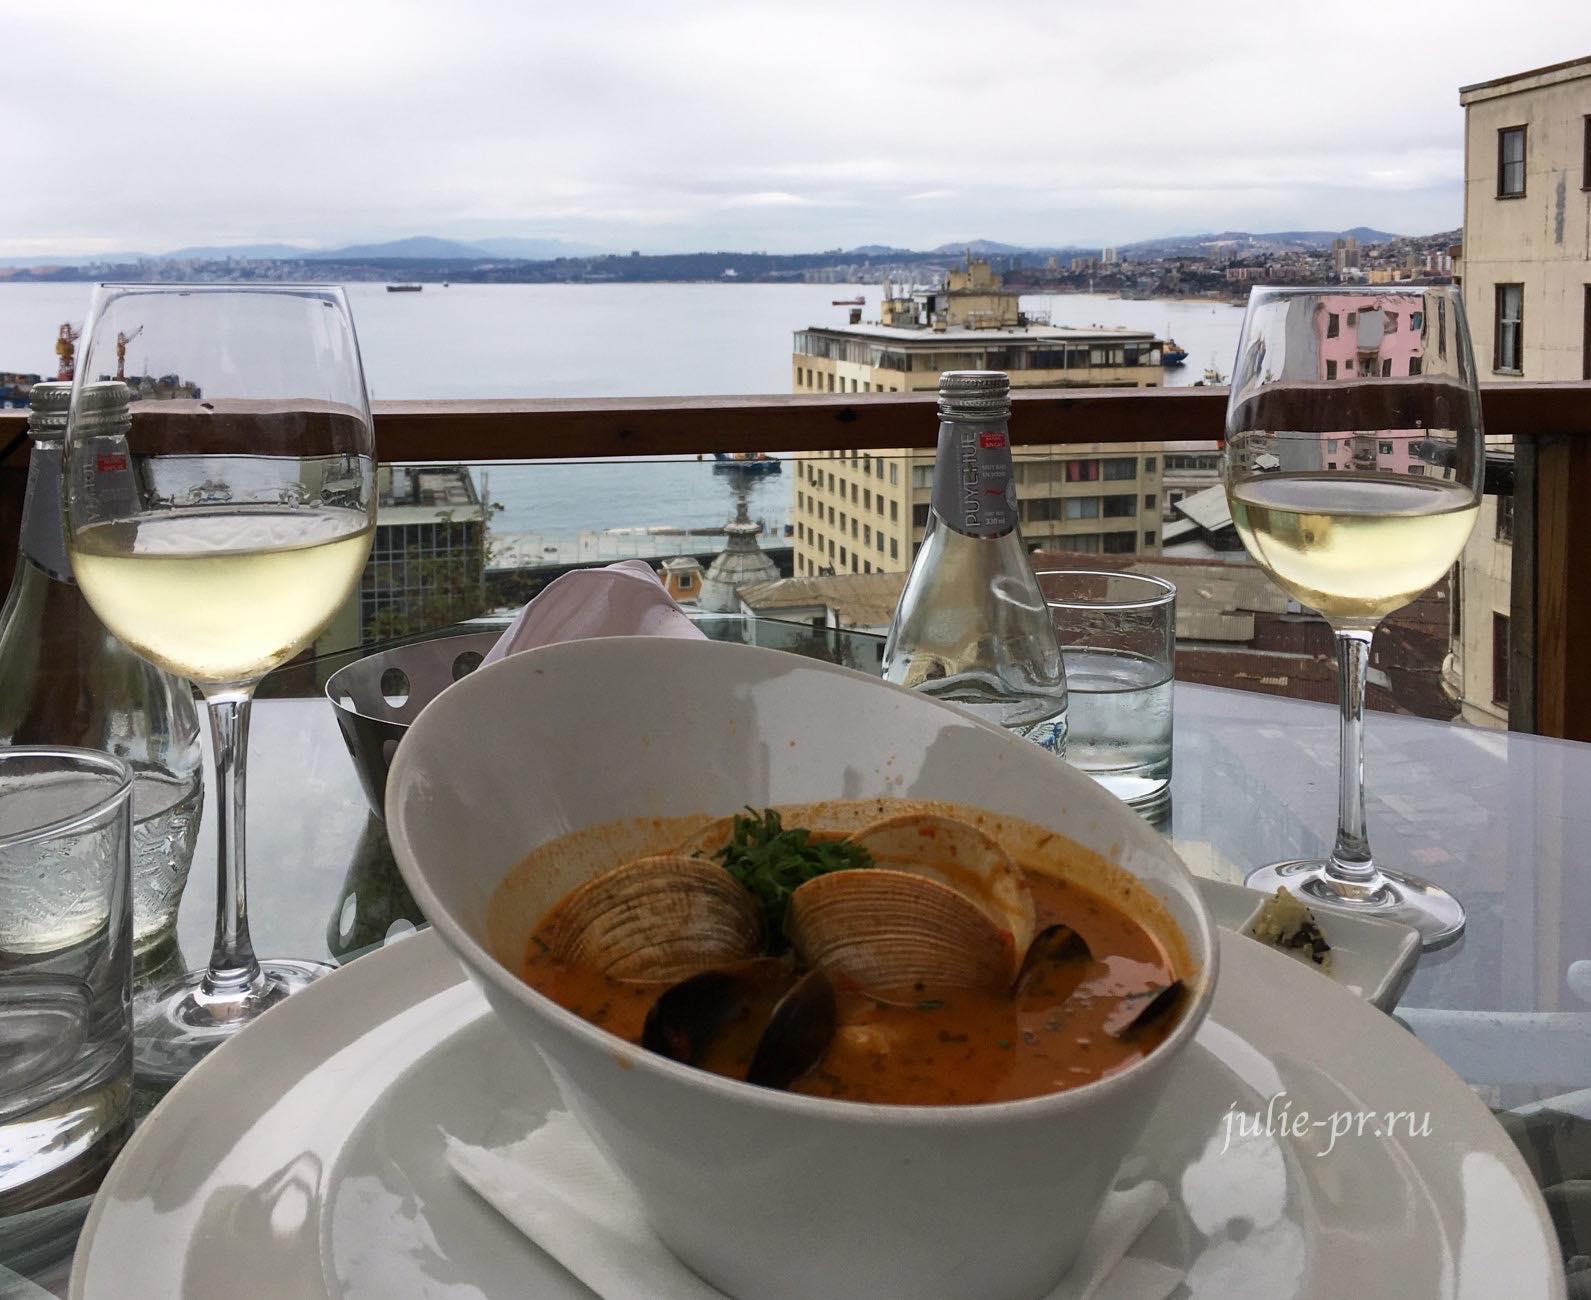 Чили, Вальпараисо, ресторан La Concepcion